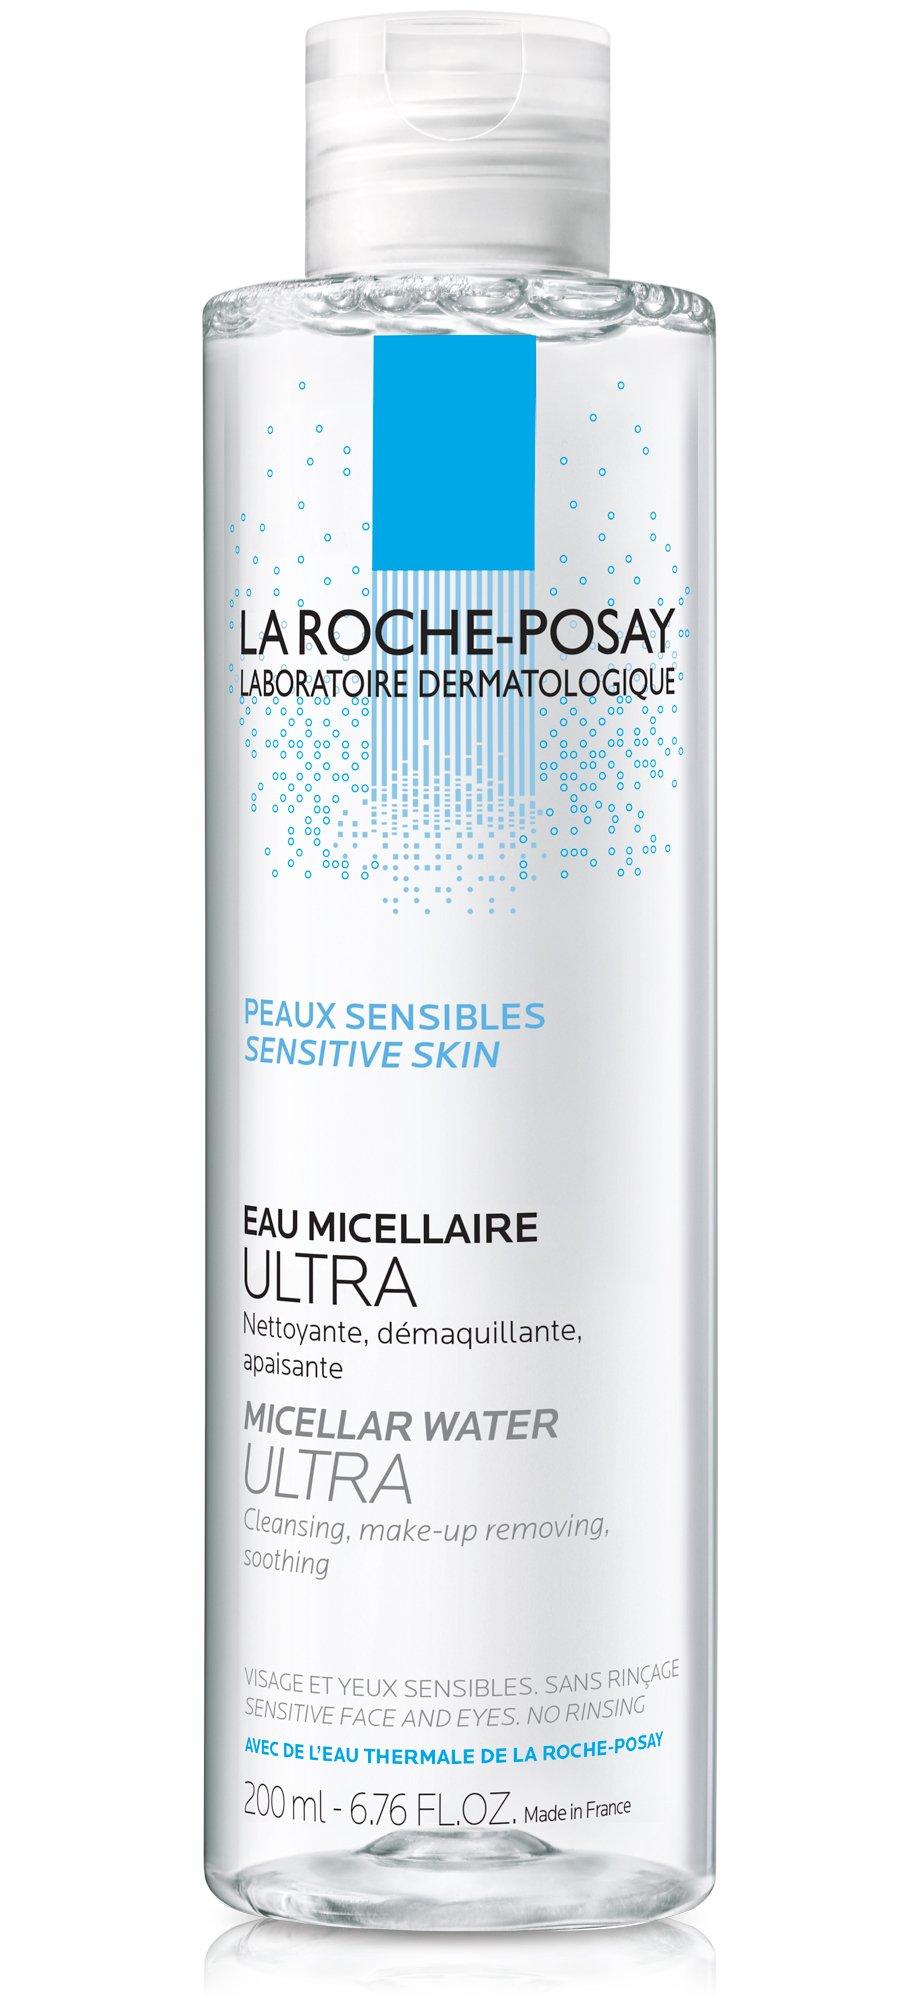 La Roche Posay Solución Micelar Fisiológica Mujer - 450 gr product image